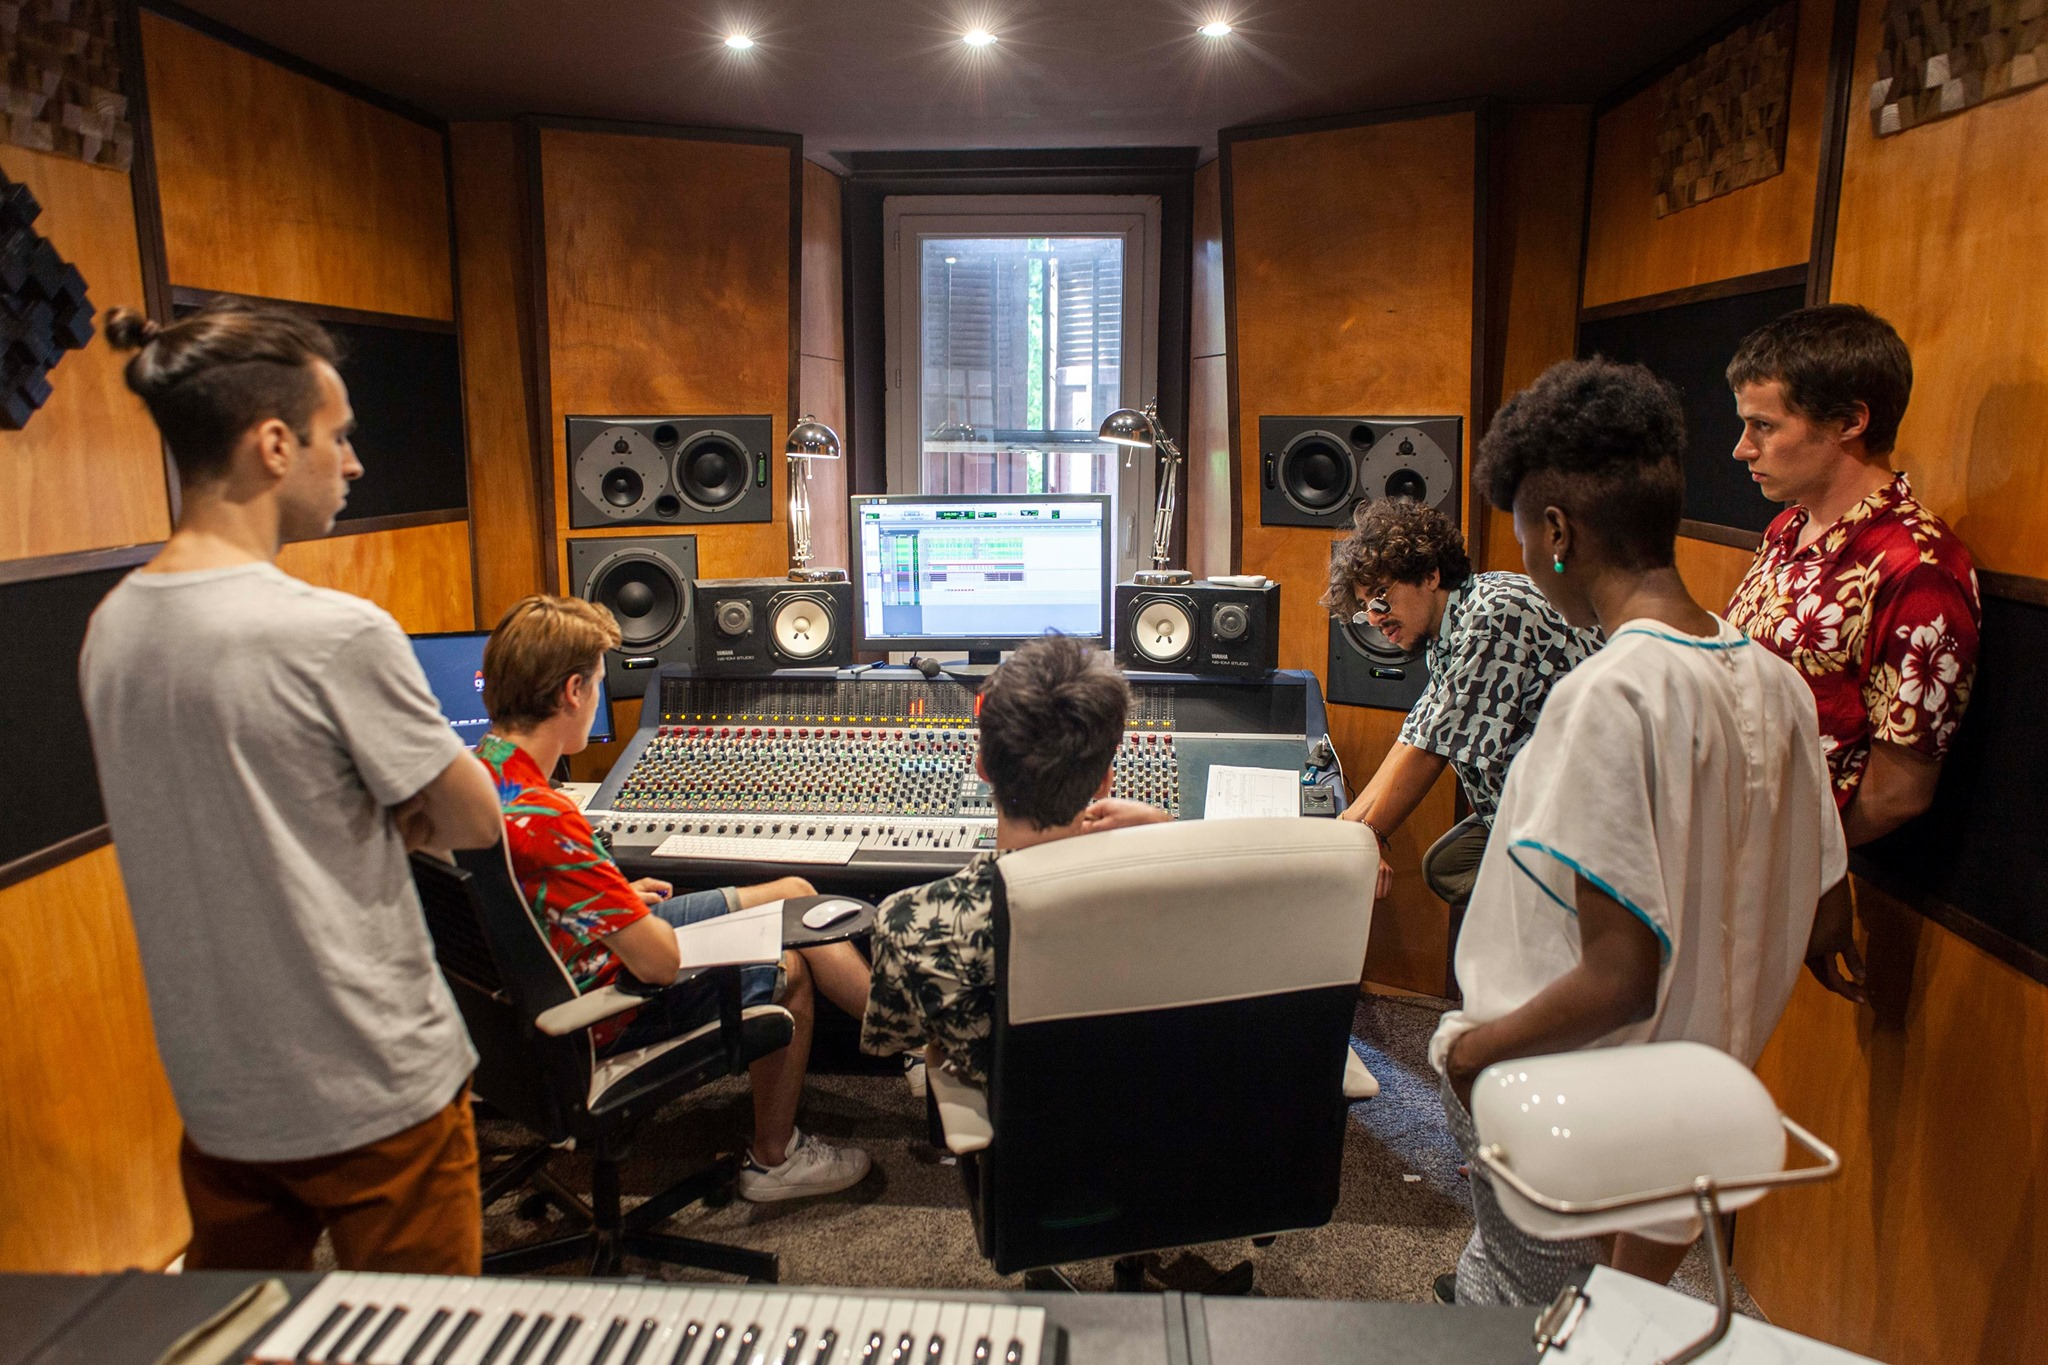 Recreation ft. Tina Mweni - Denger studio Marseille. July 2019 Photo: Nina Gat